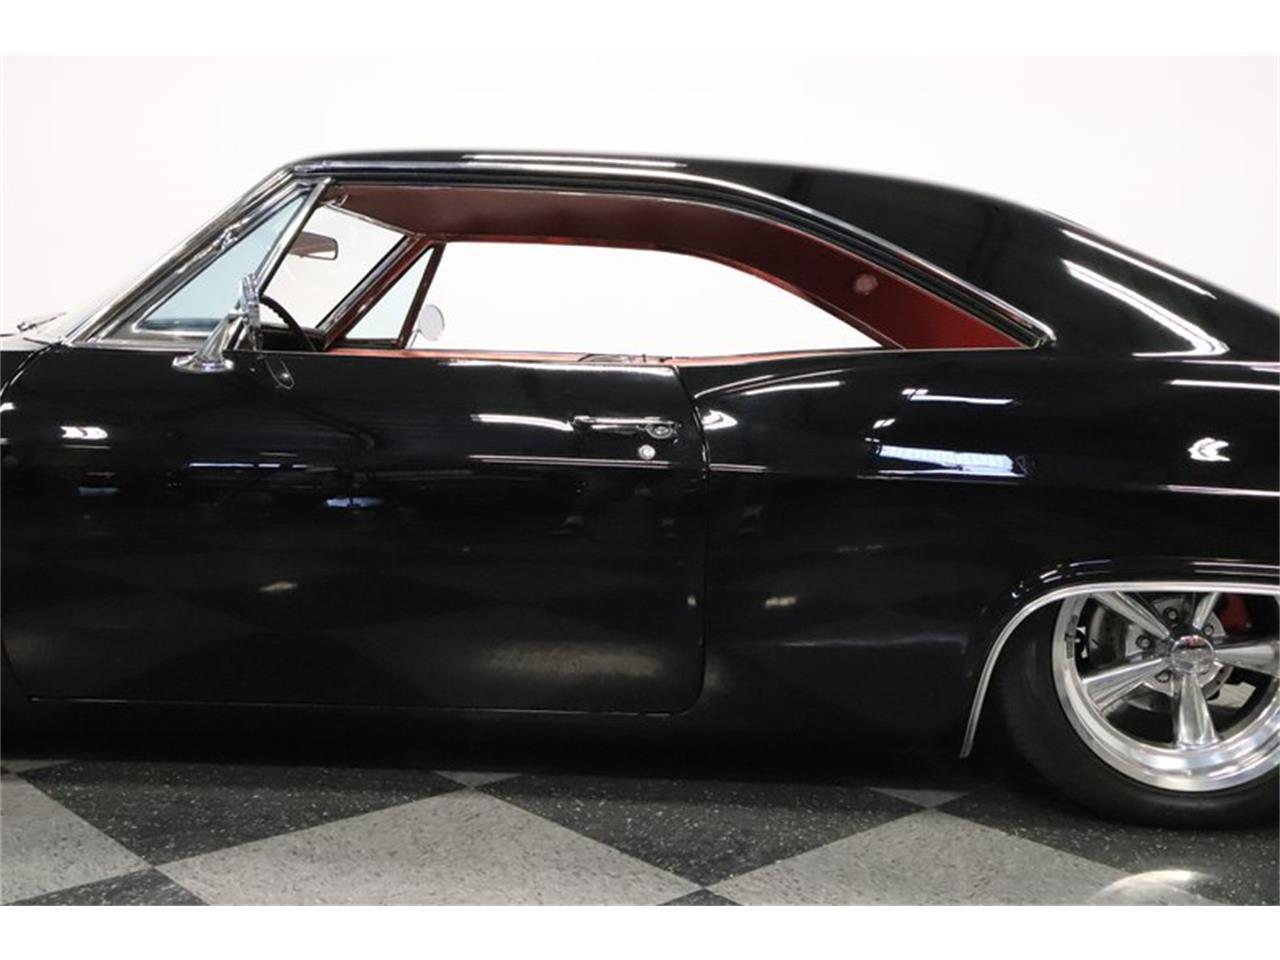 Large Picture of 1966 Impala located in Arizona - $52,995.00 - Q2EF